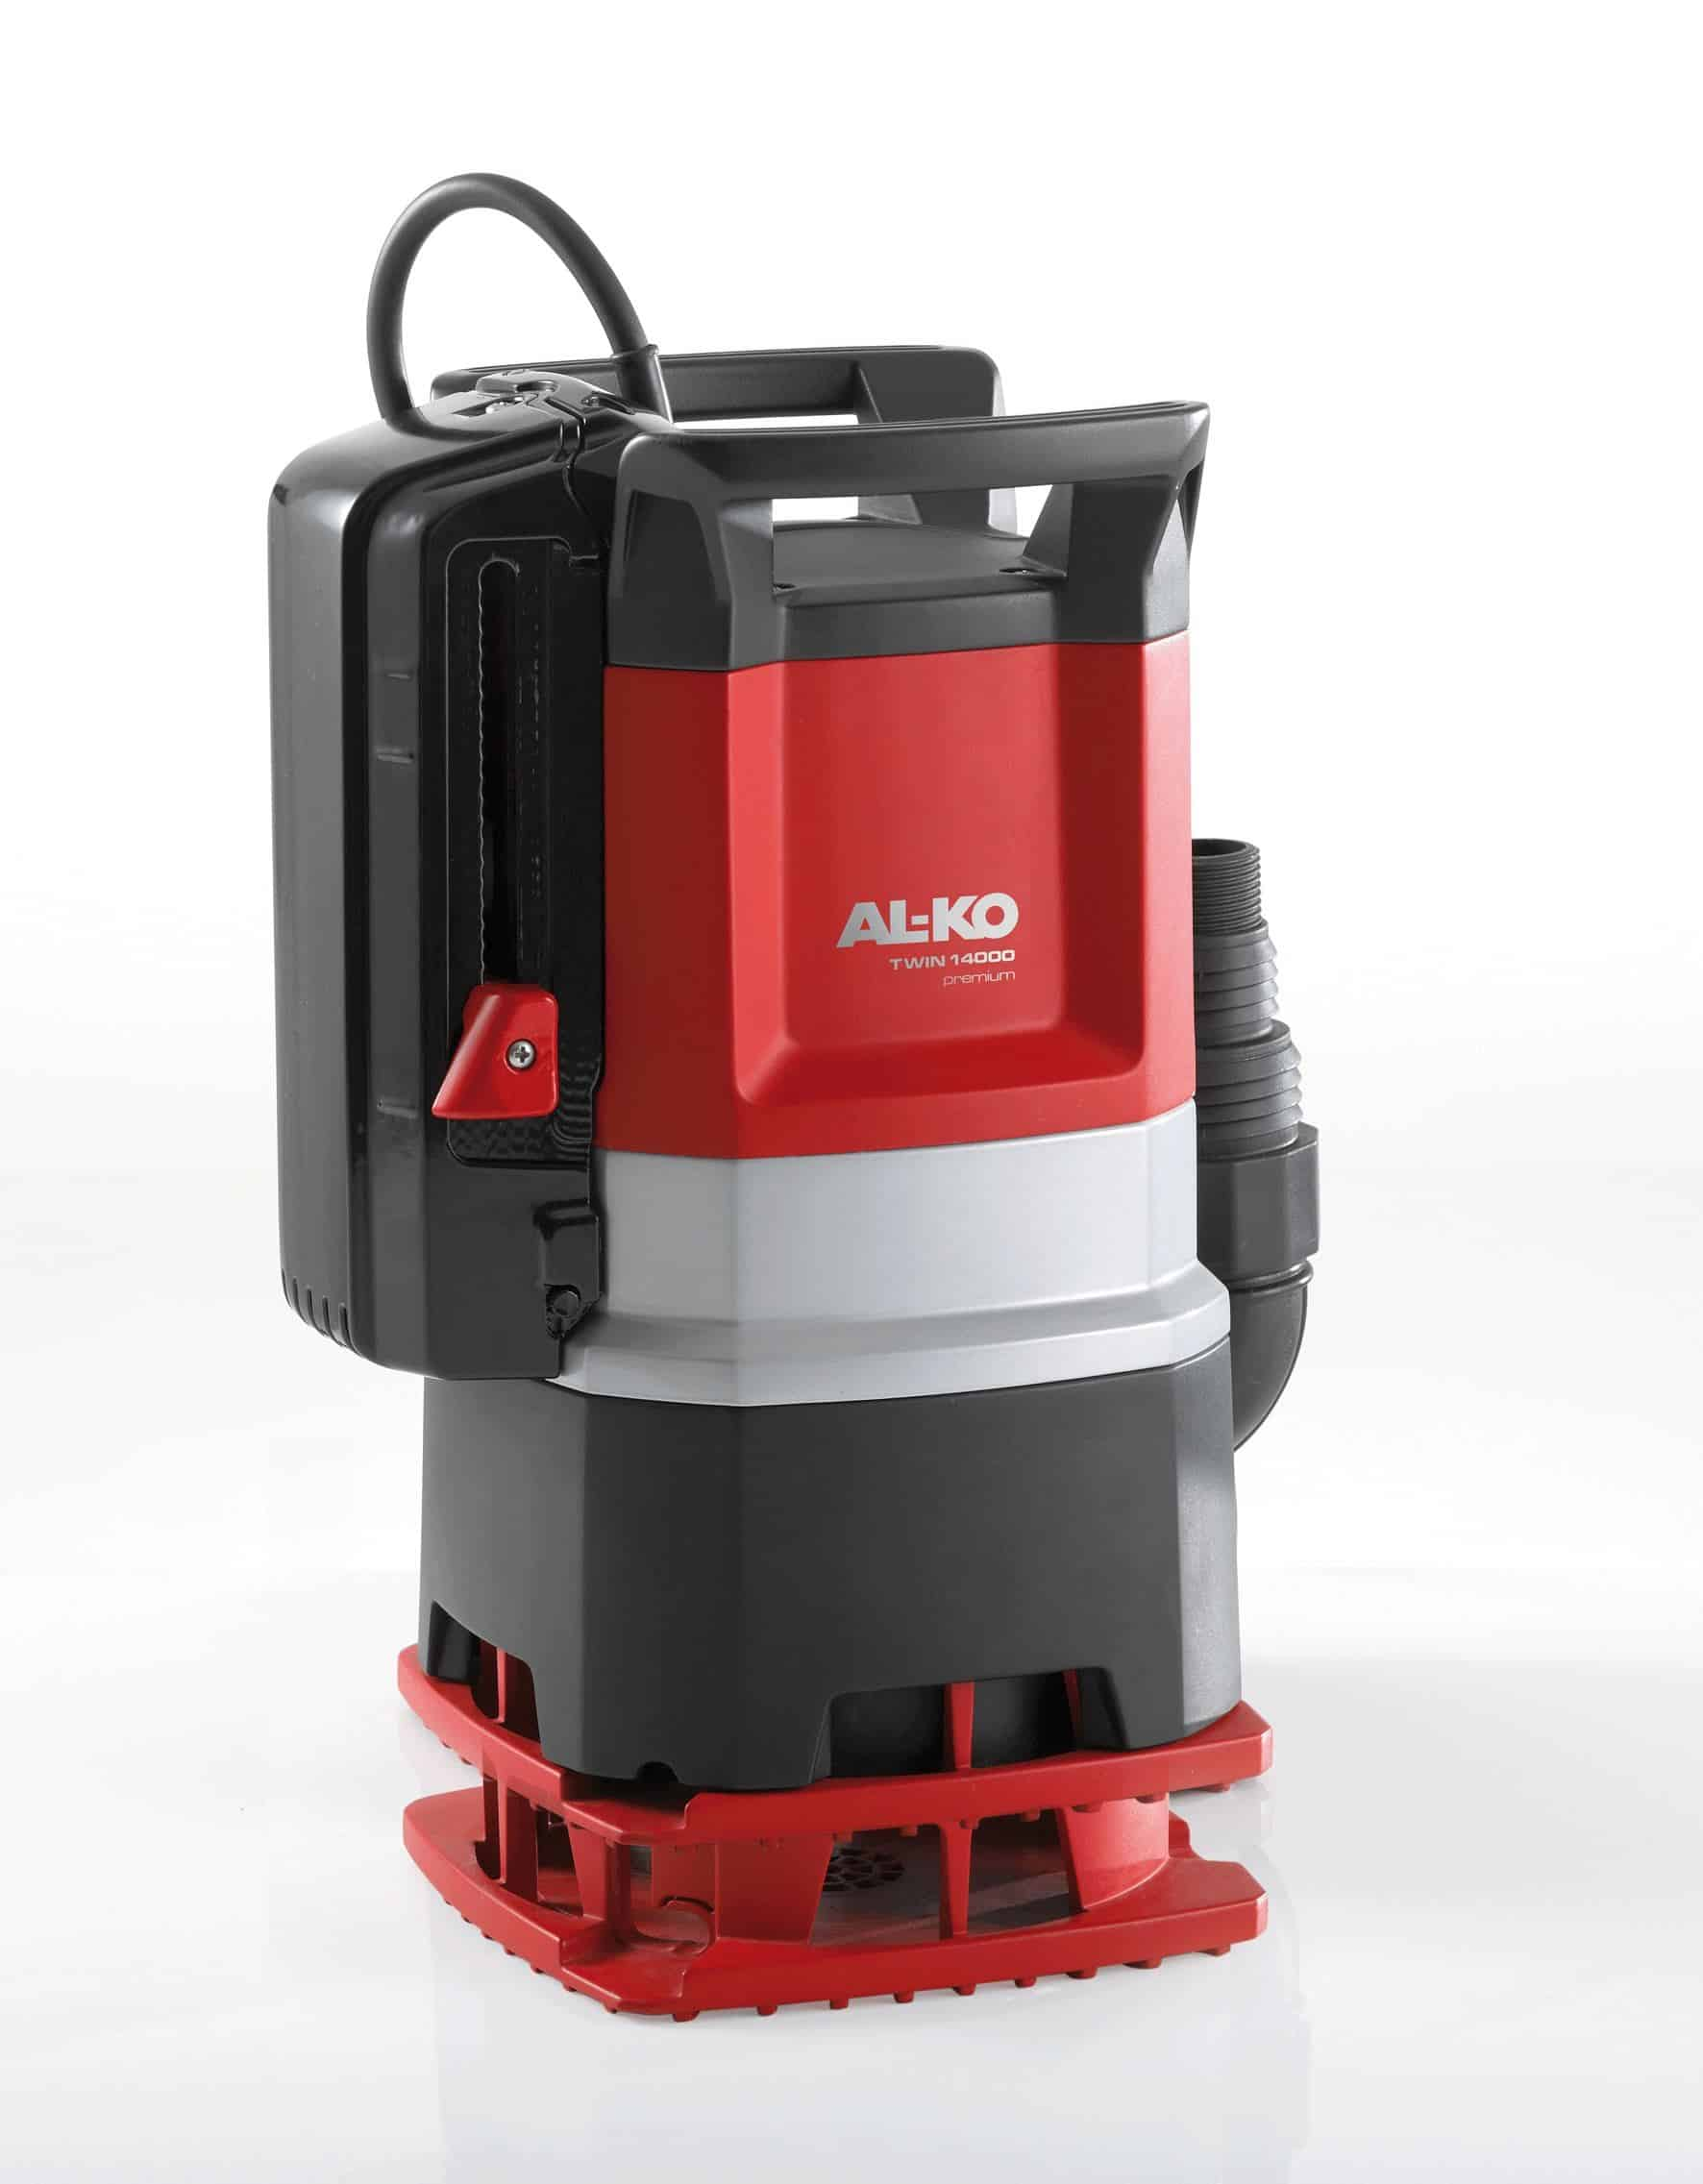 «Al-Ko» Twin 14000 Premium